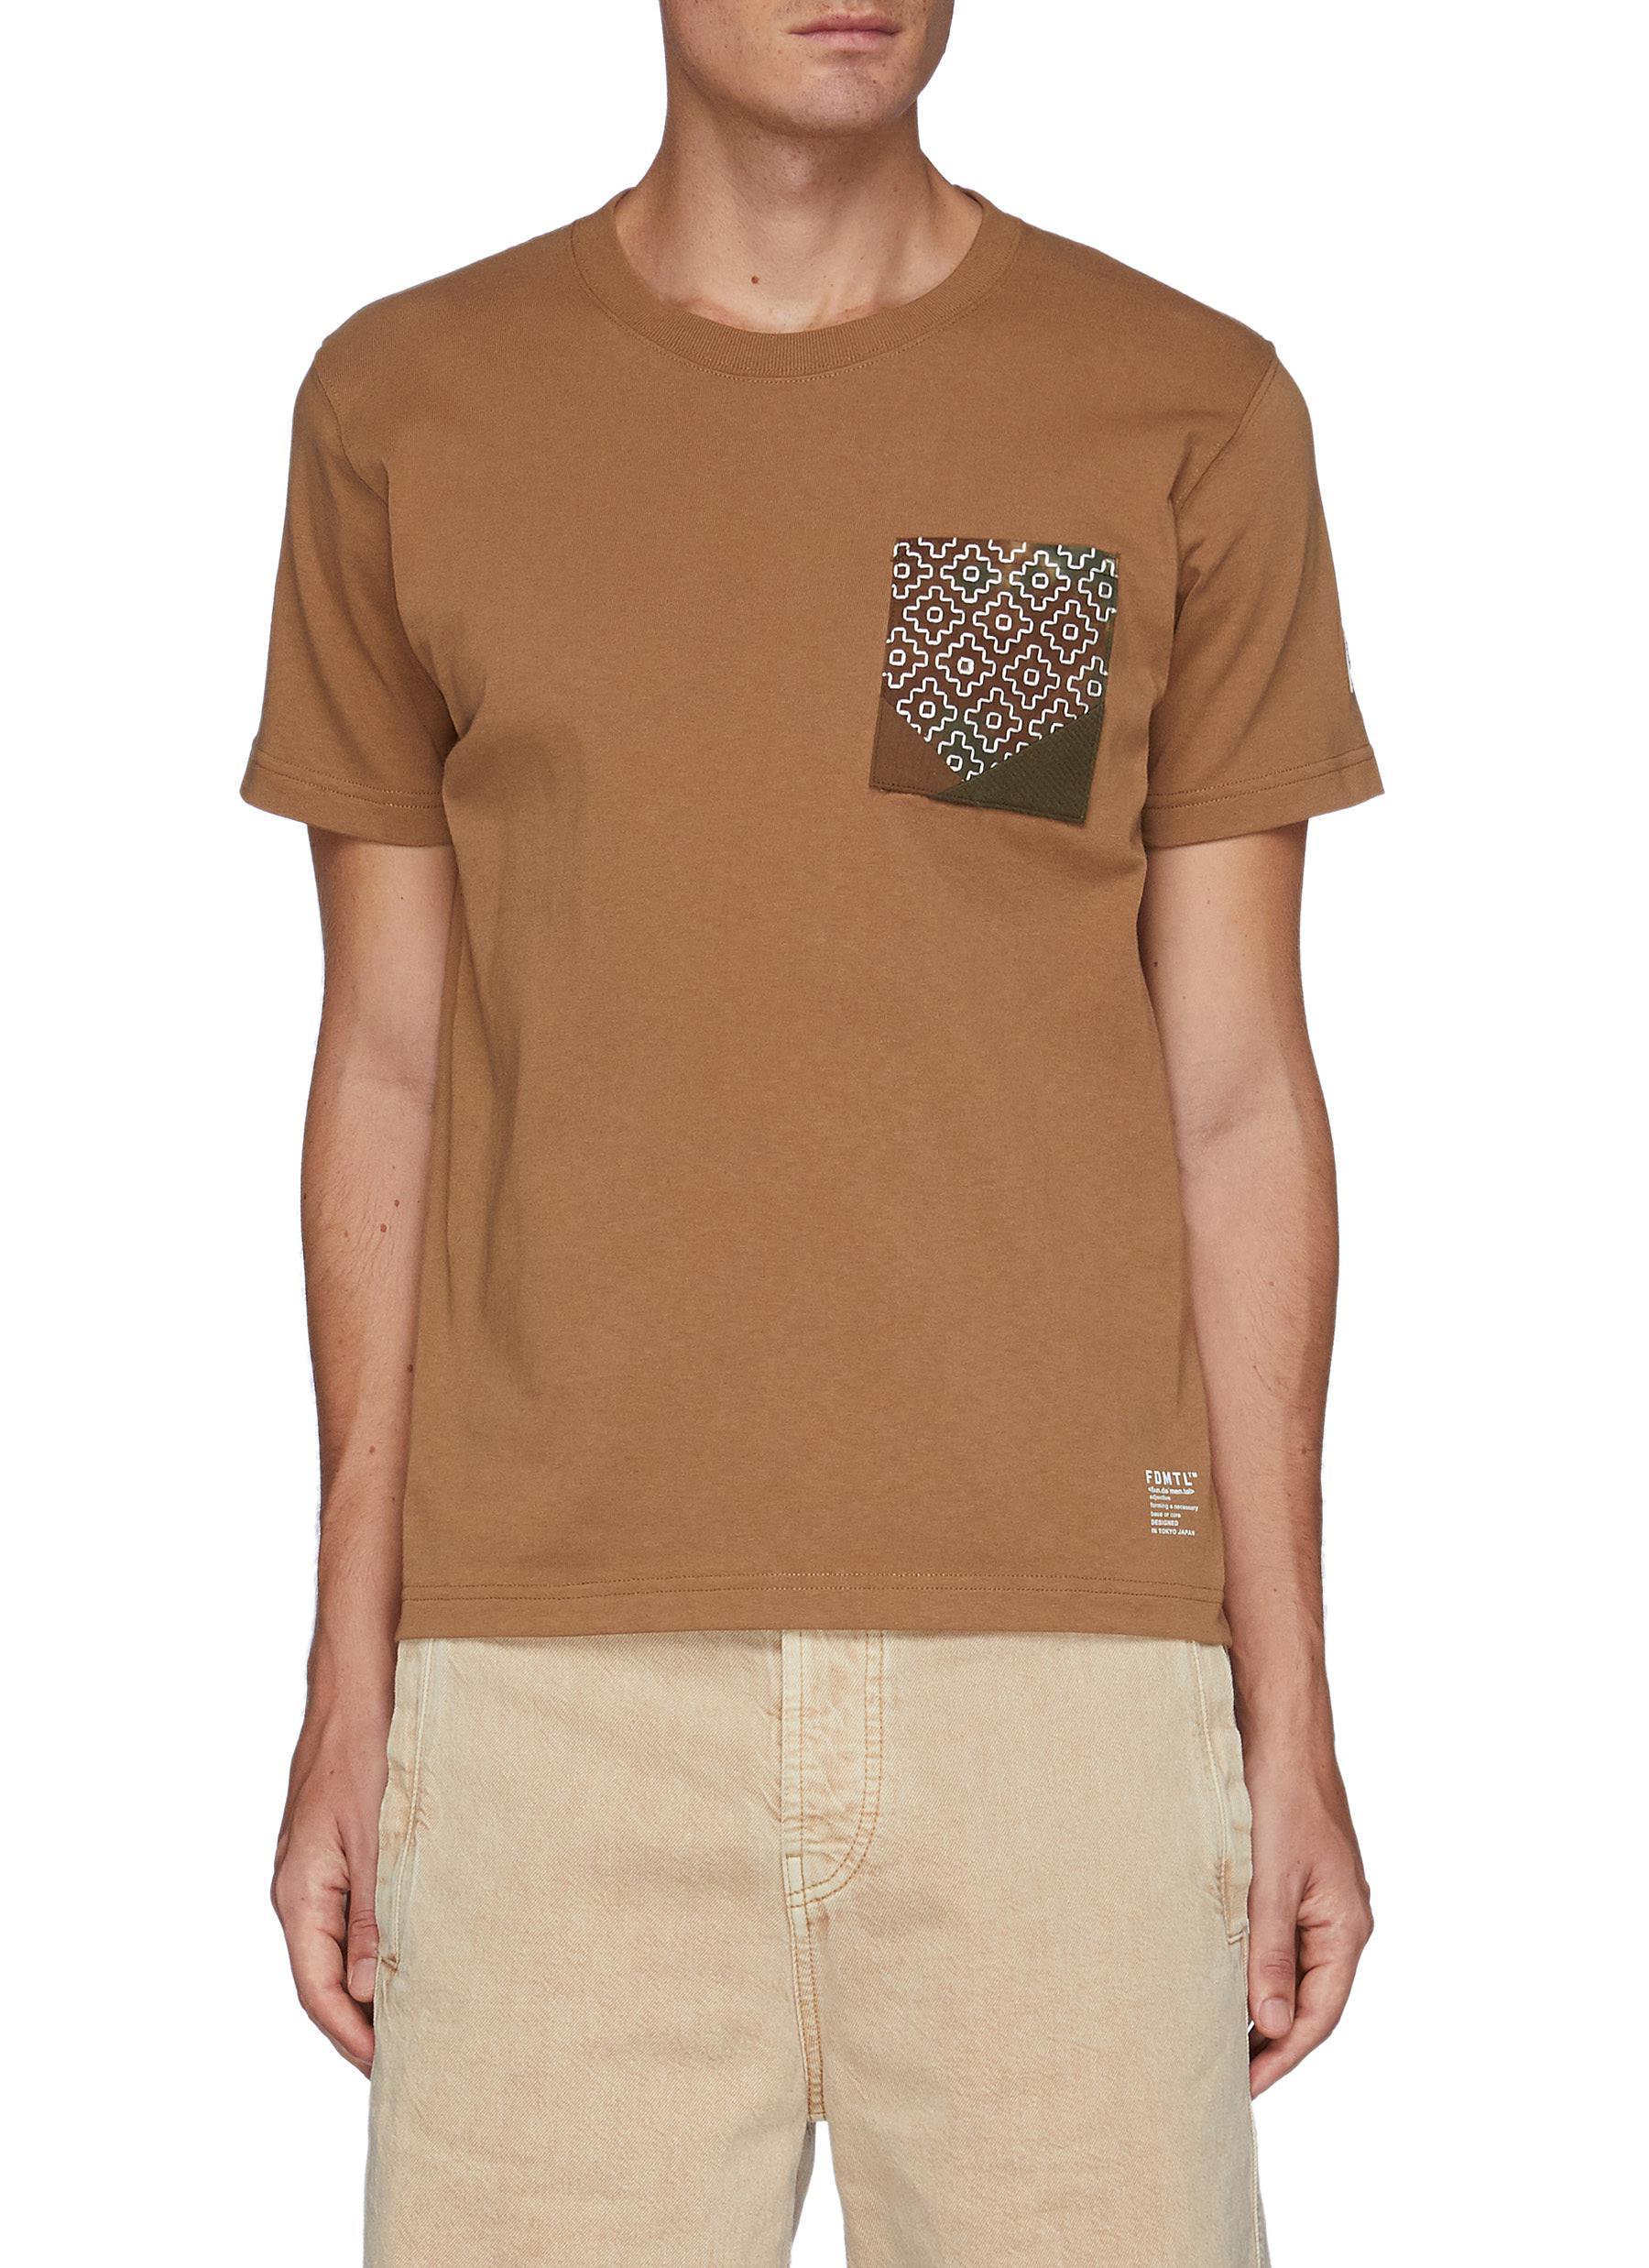 Sashiko Chest Patch Crewneck Cotton T-shirt